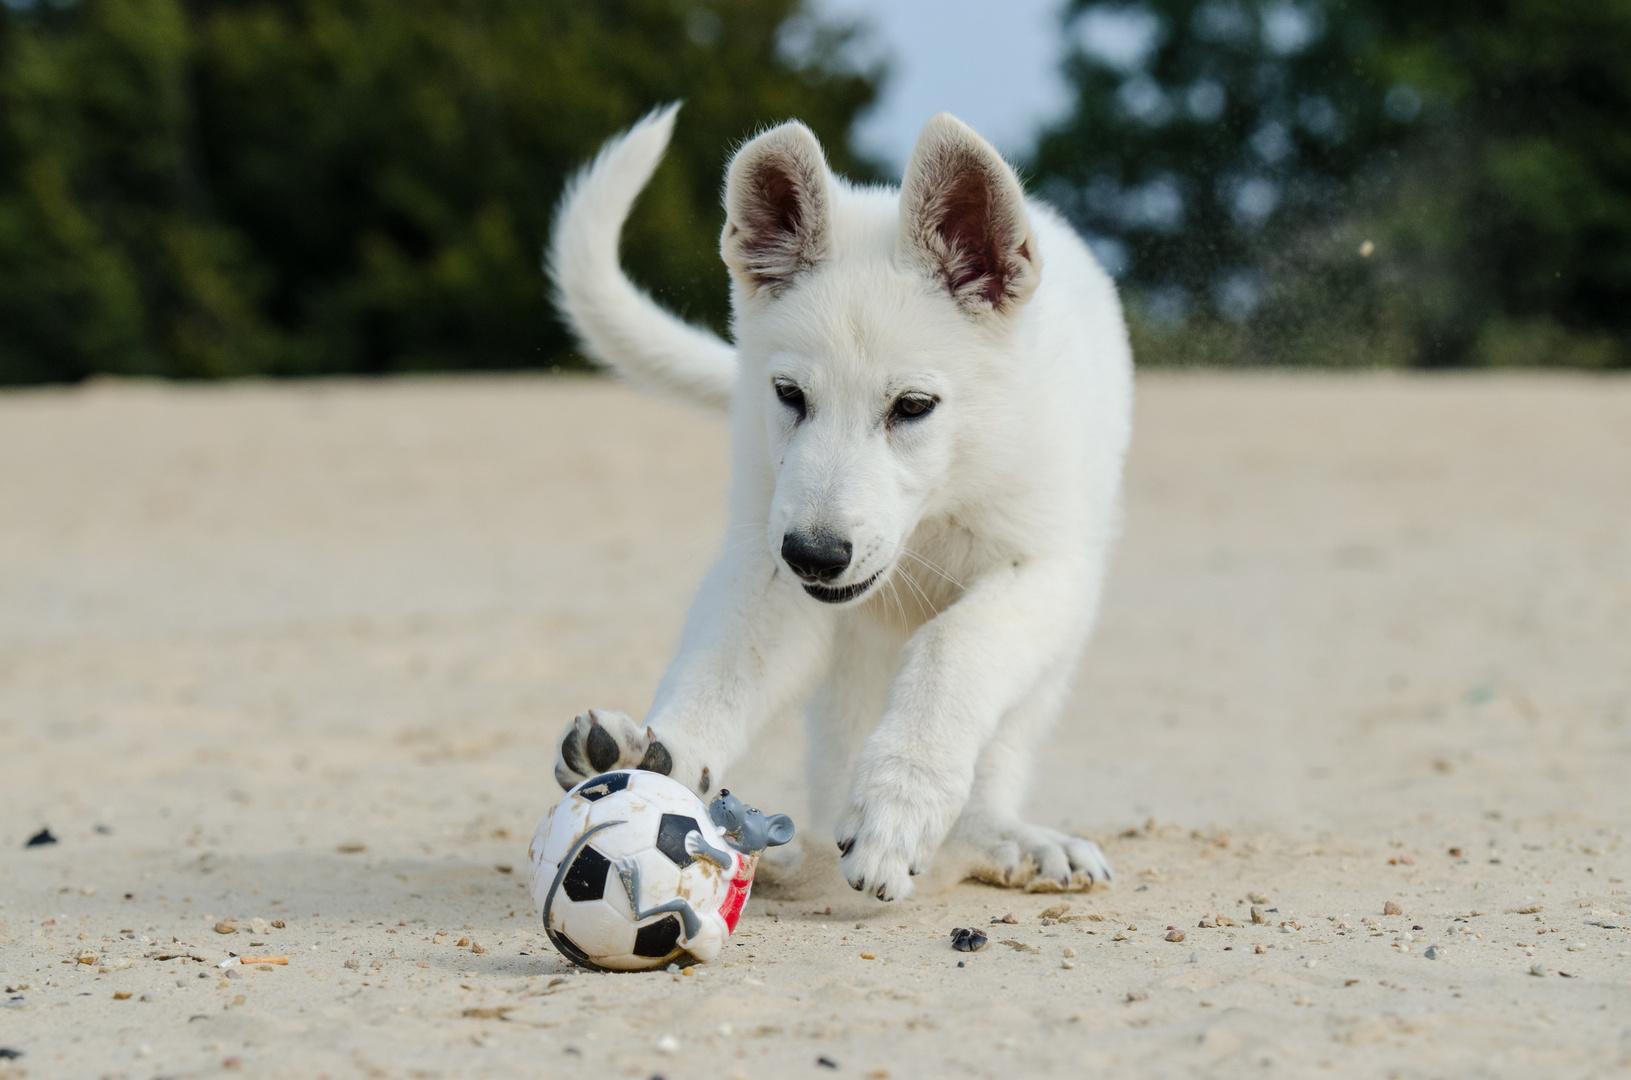 Cajun mit seinem Lieblingsball